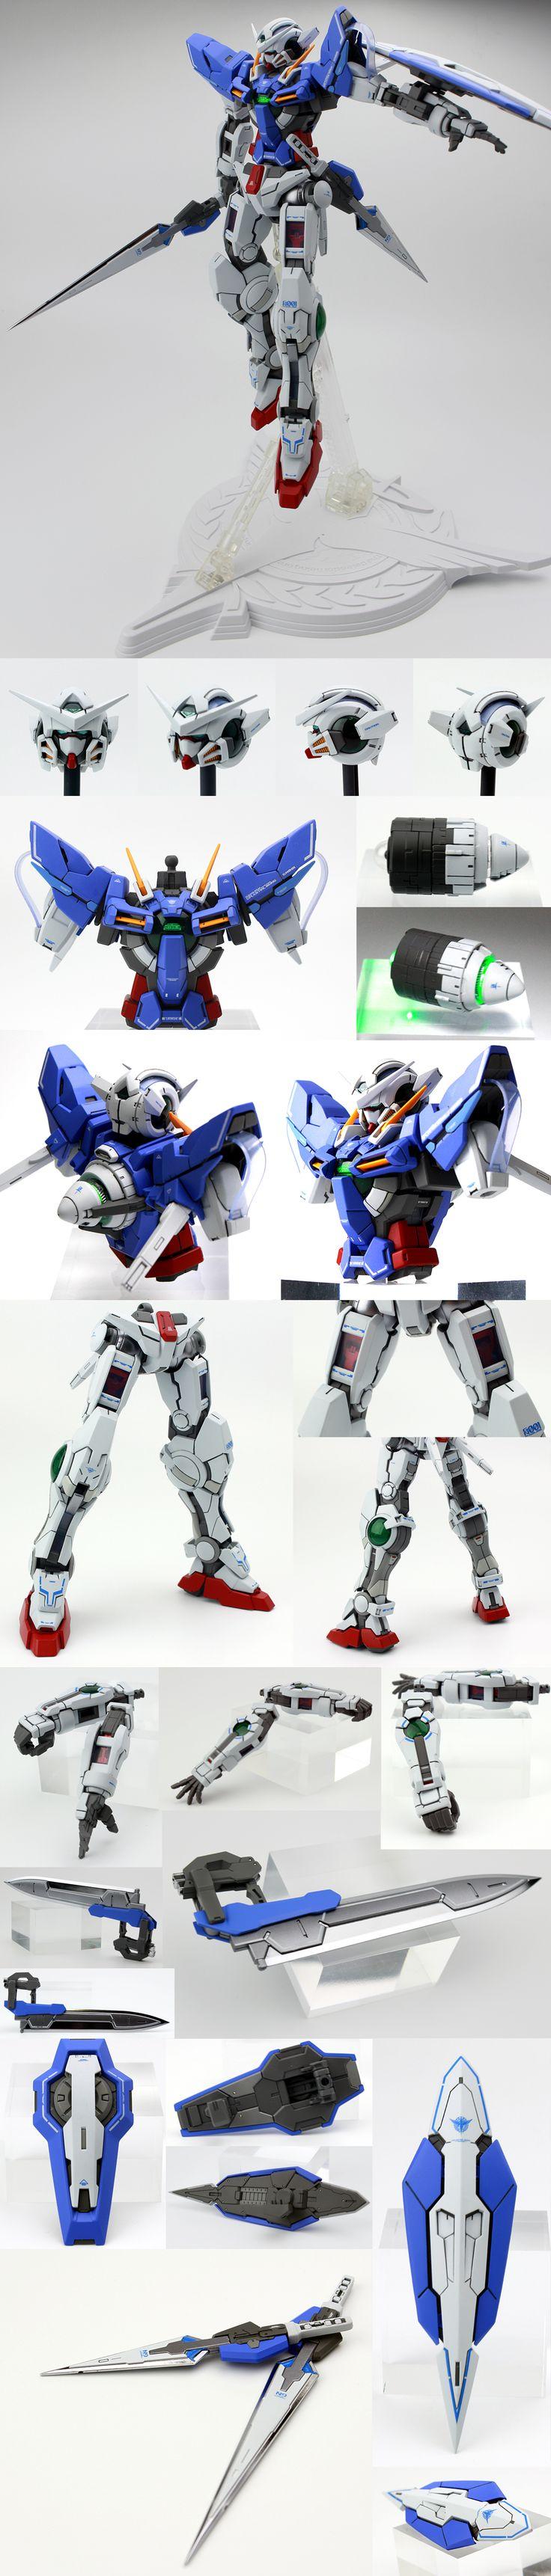 ★★ 1/100 MG ガンダム エクシア 塗装済完成品 ★★ - ヤフオク!